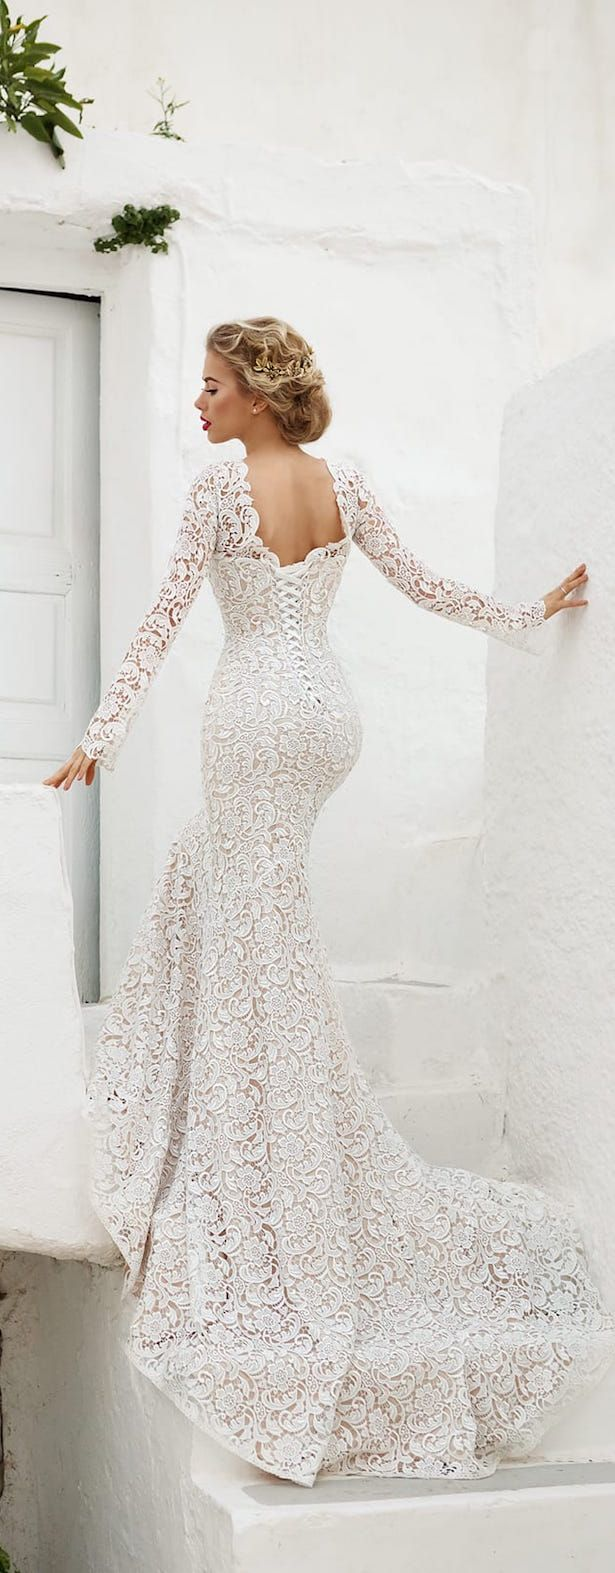 Wedding-Dresses-0727